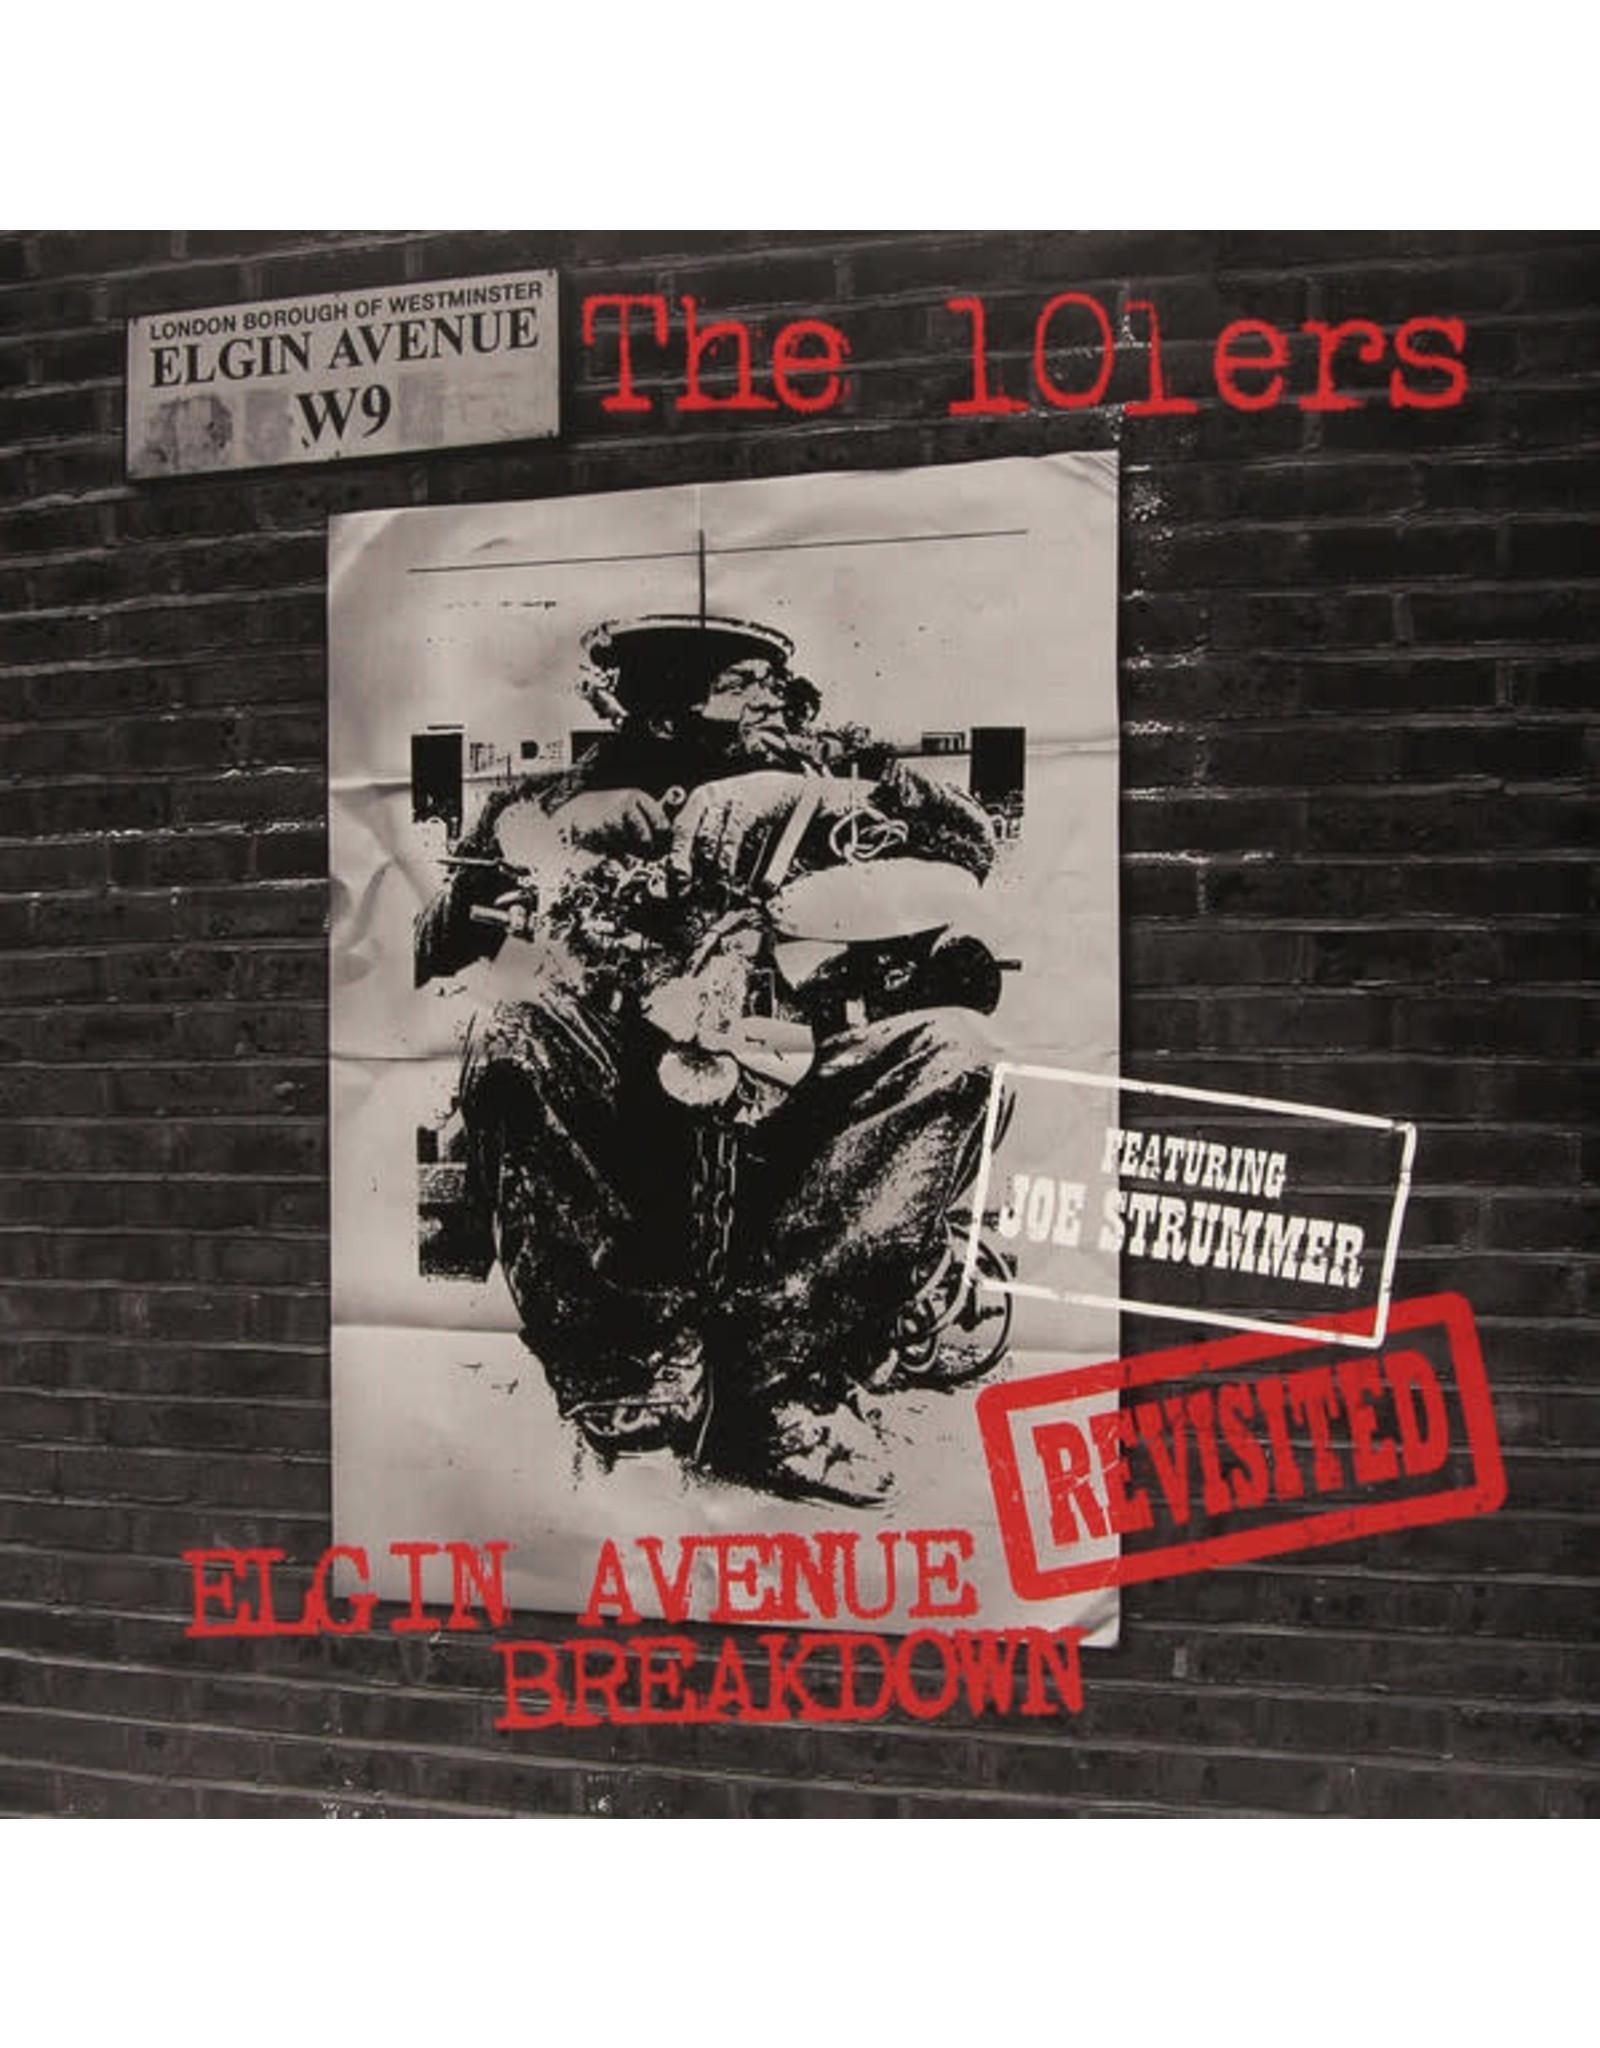 101ers (feat Joe Strummer) - Elgin Avenue Breakdown (2LP/red vinyl) Revisited